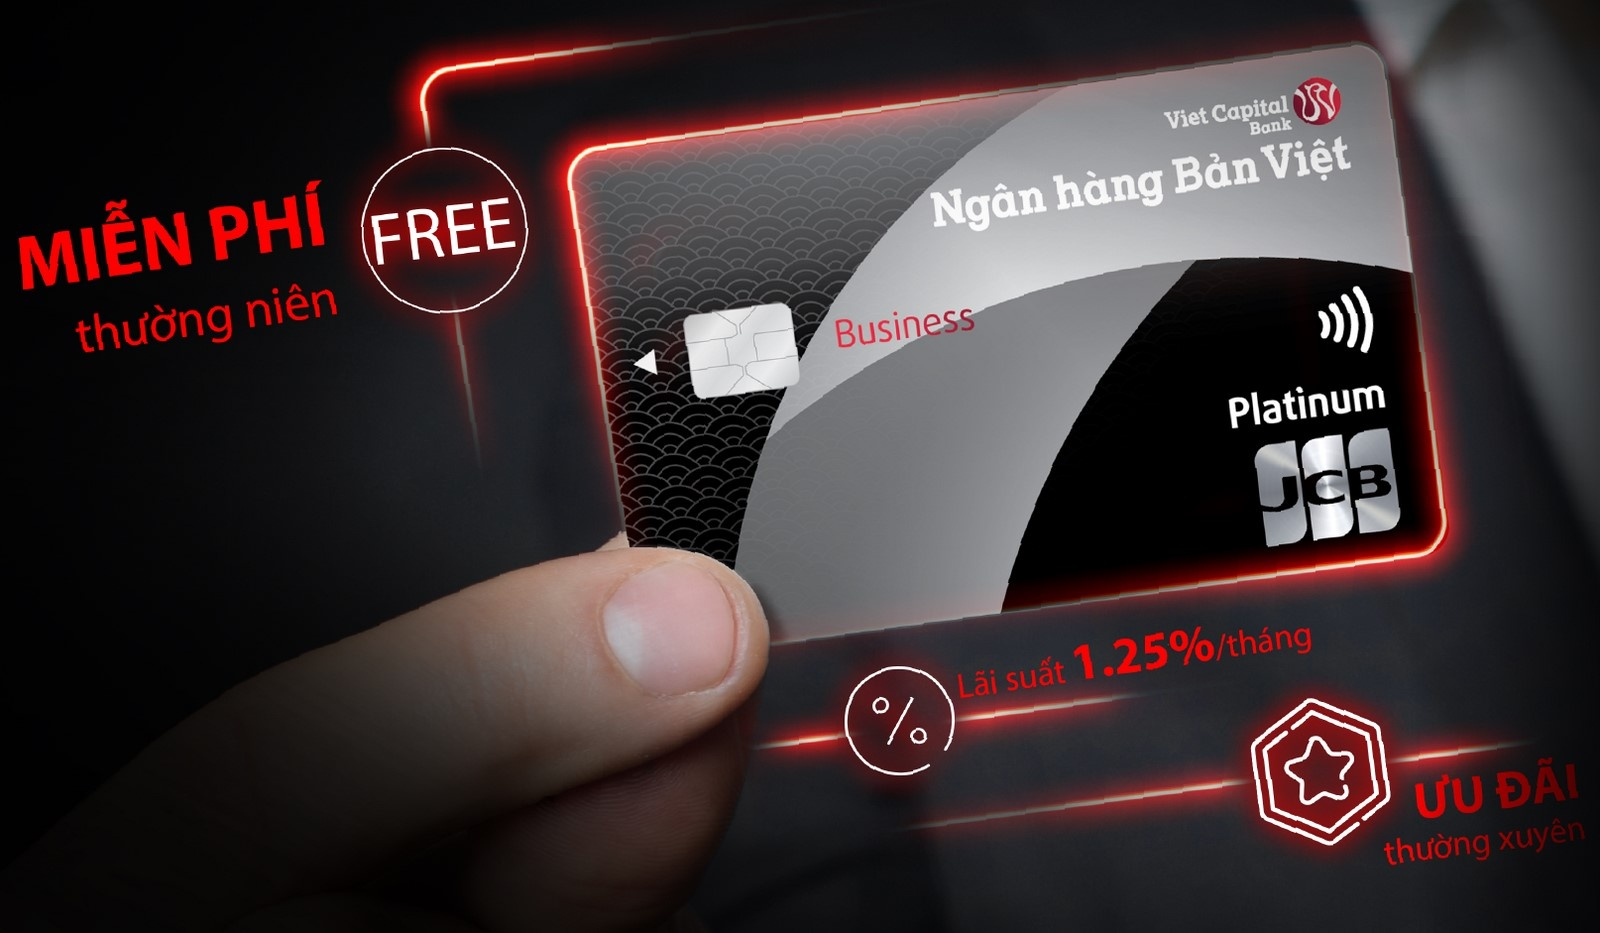 ngoi nha mo the tin dung online